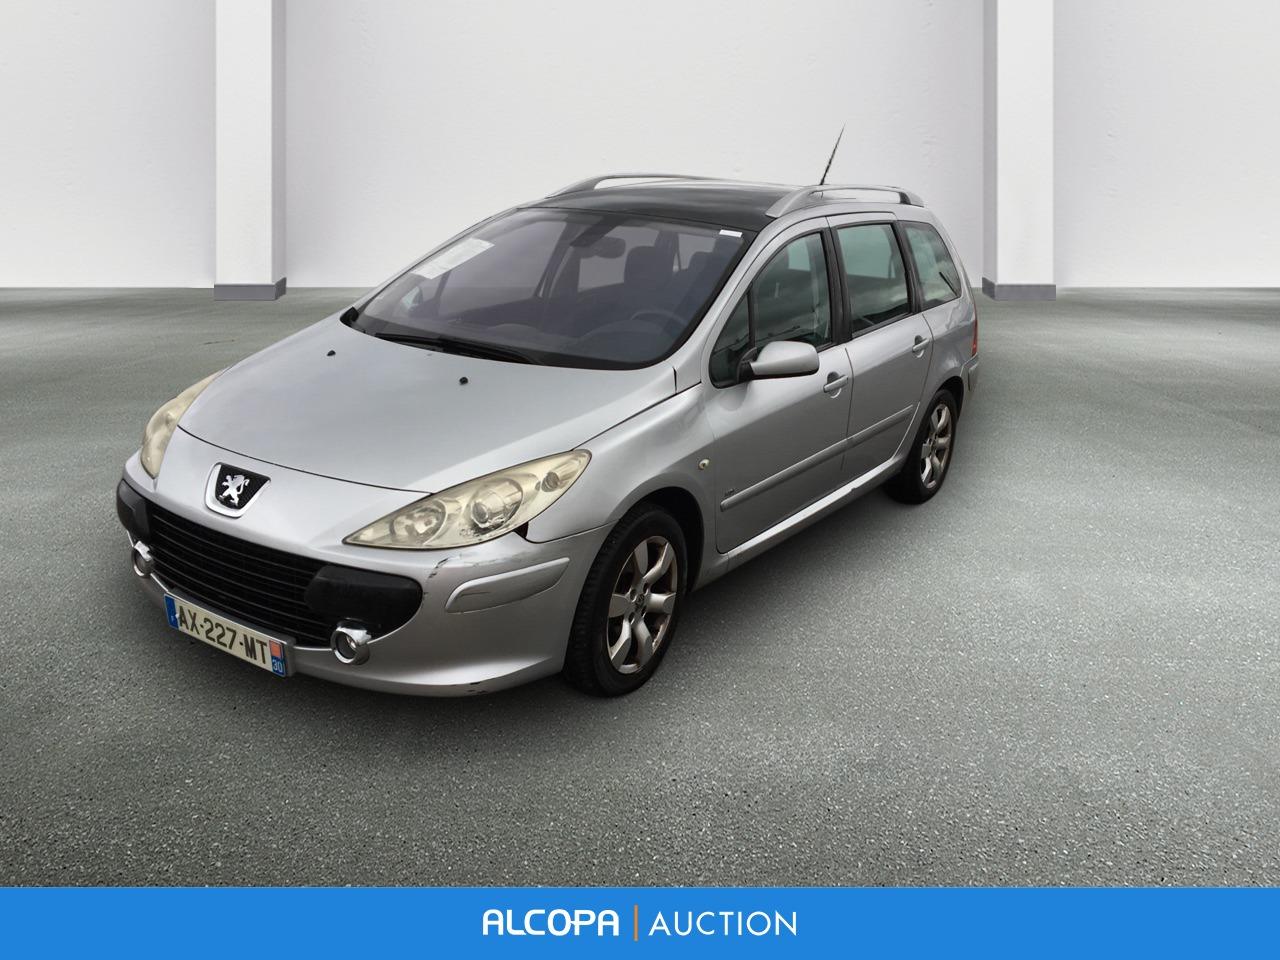 Peugeot 307 Sw 1 6 Hdi 110 : peugeot 307 sw 307 sw 1 6 hdi 16v 110 alcopa auction ~ Aude.kayakingforconservation.com Haus und Dekorationen